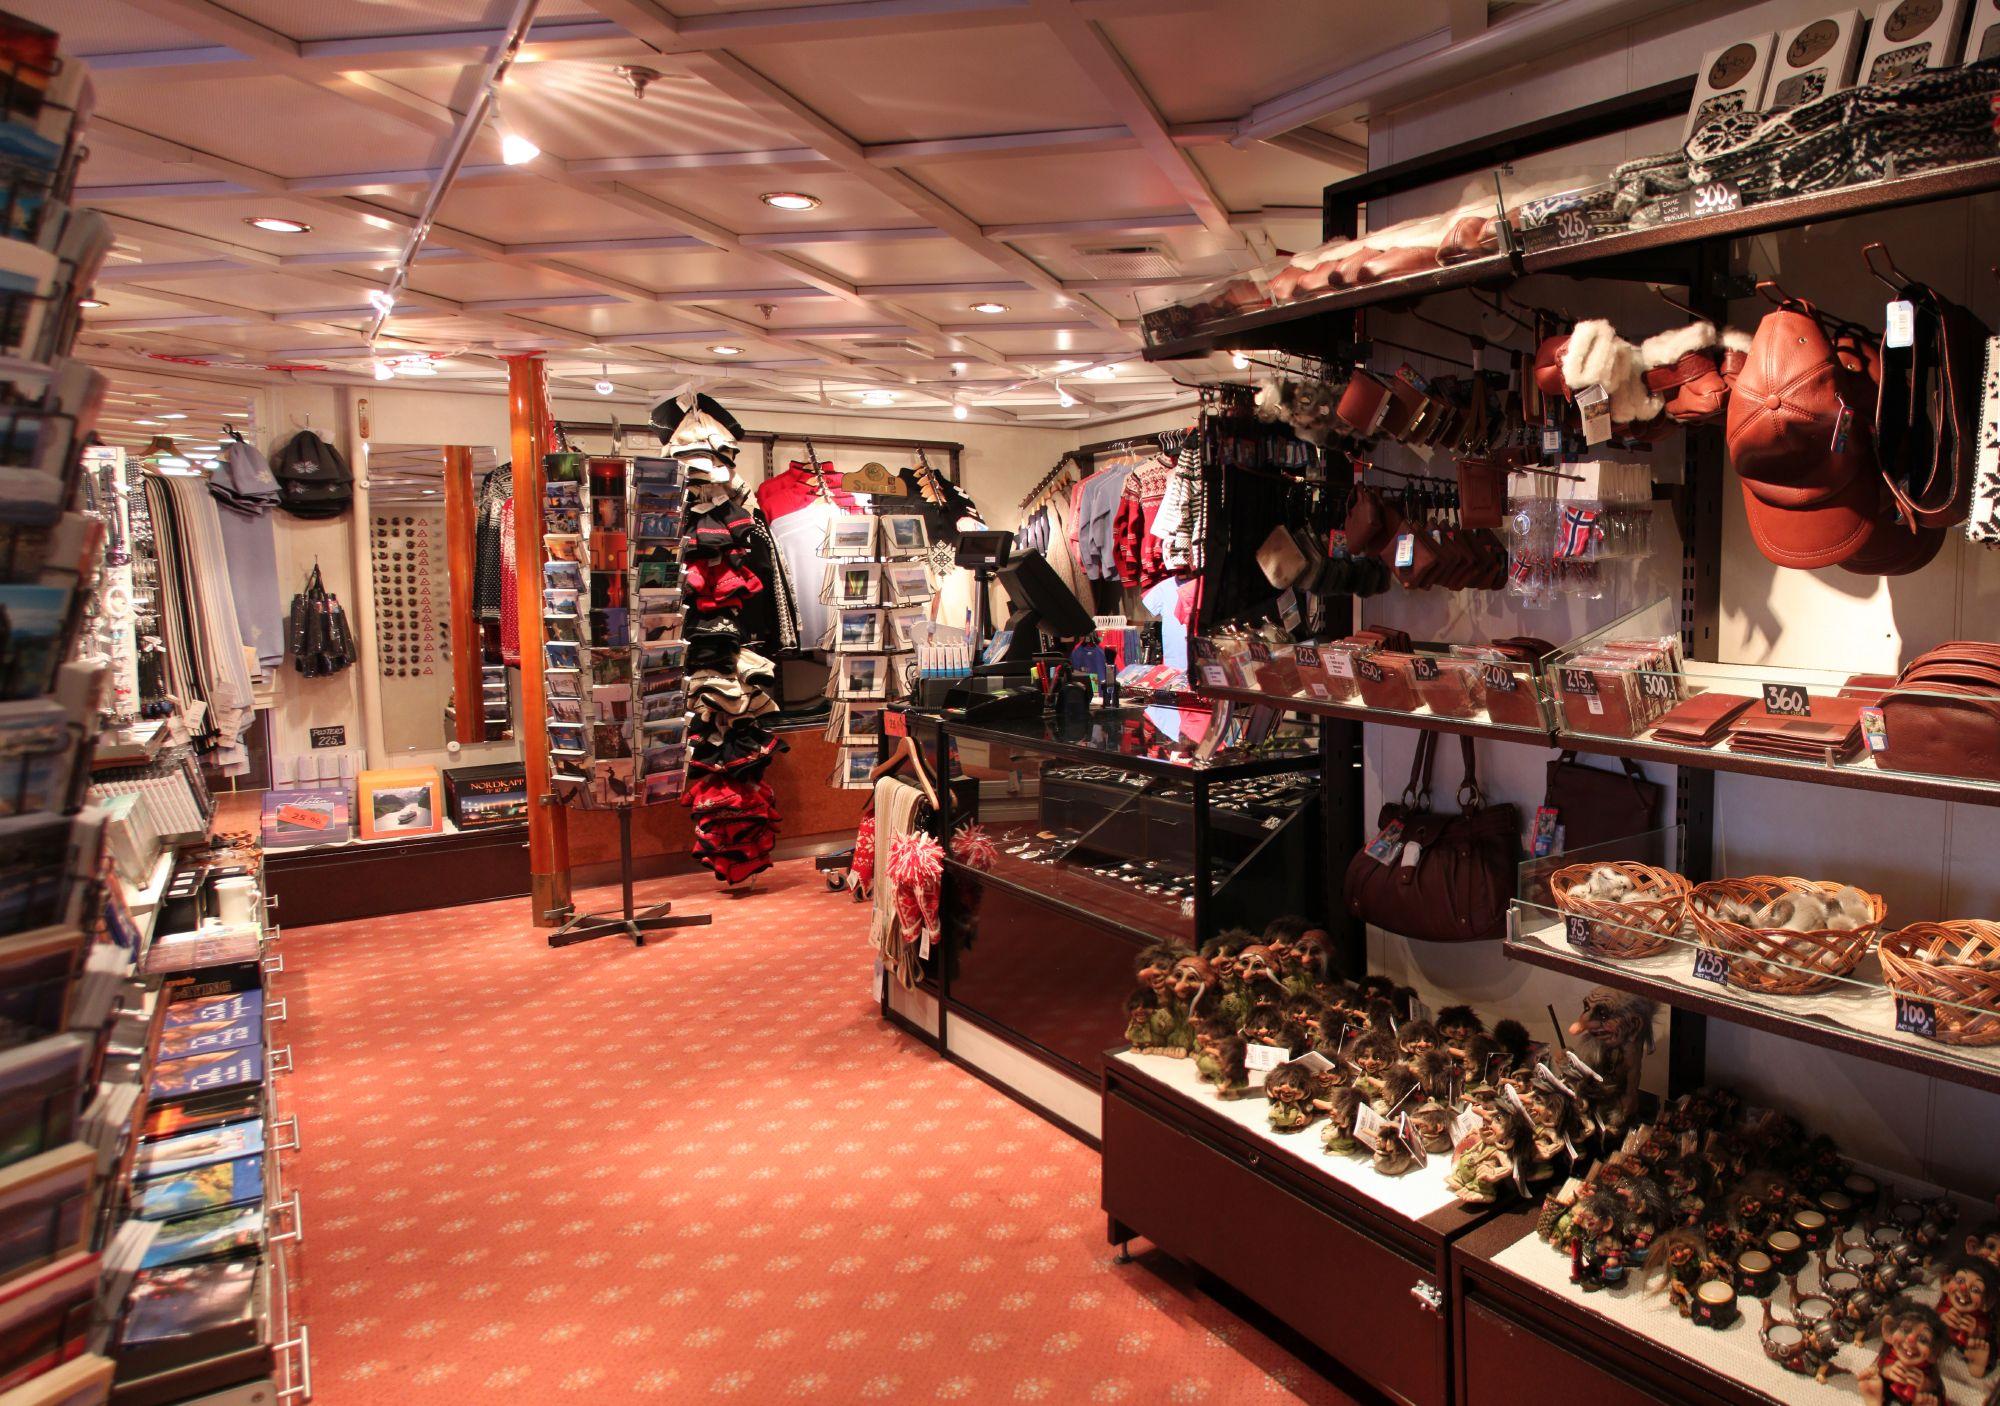 Hurtigruten Cruise Lines MS Vesteralen Interior Shops.jpg